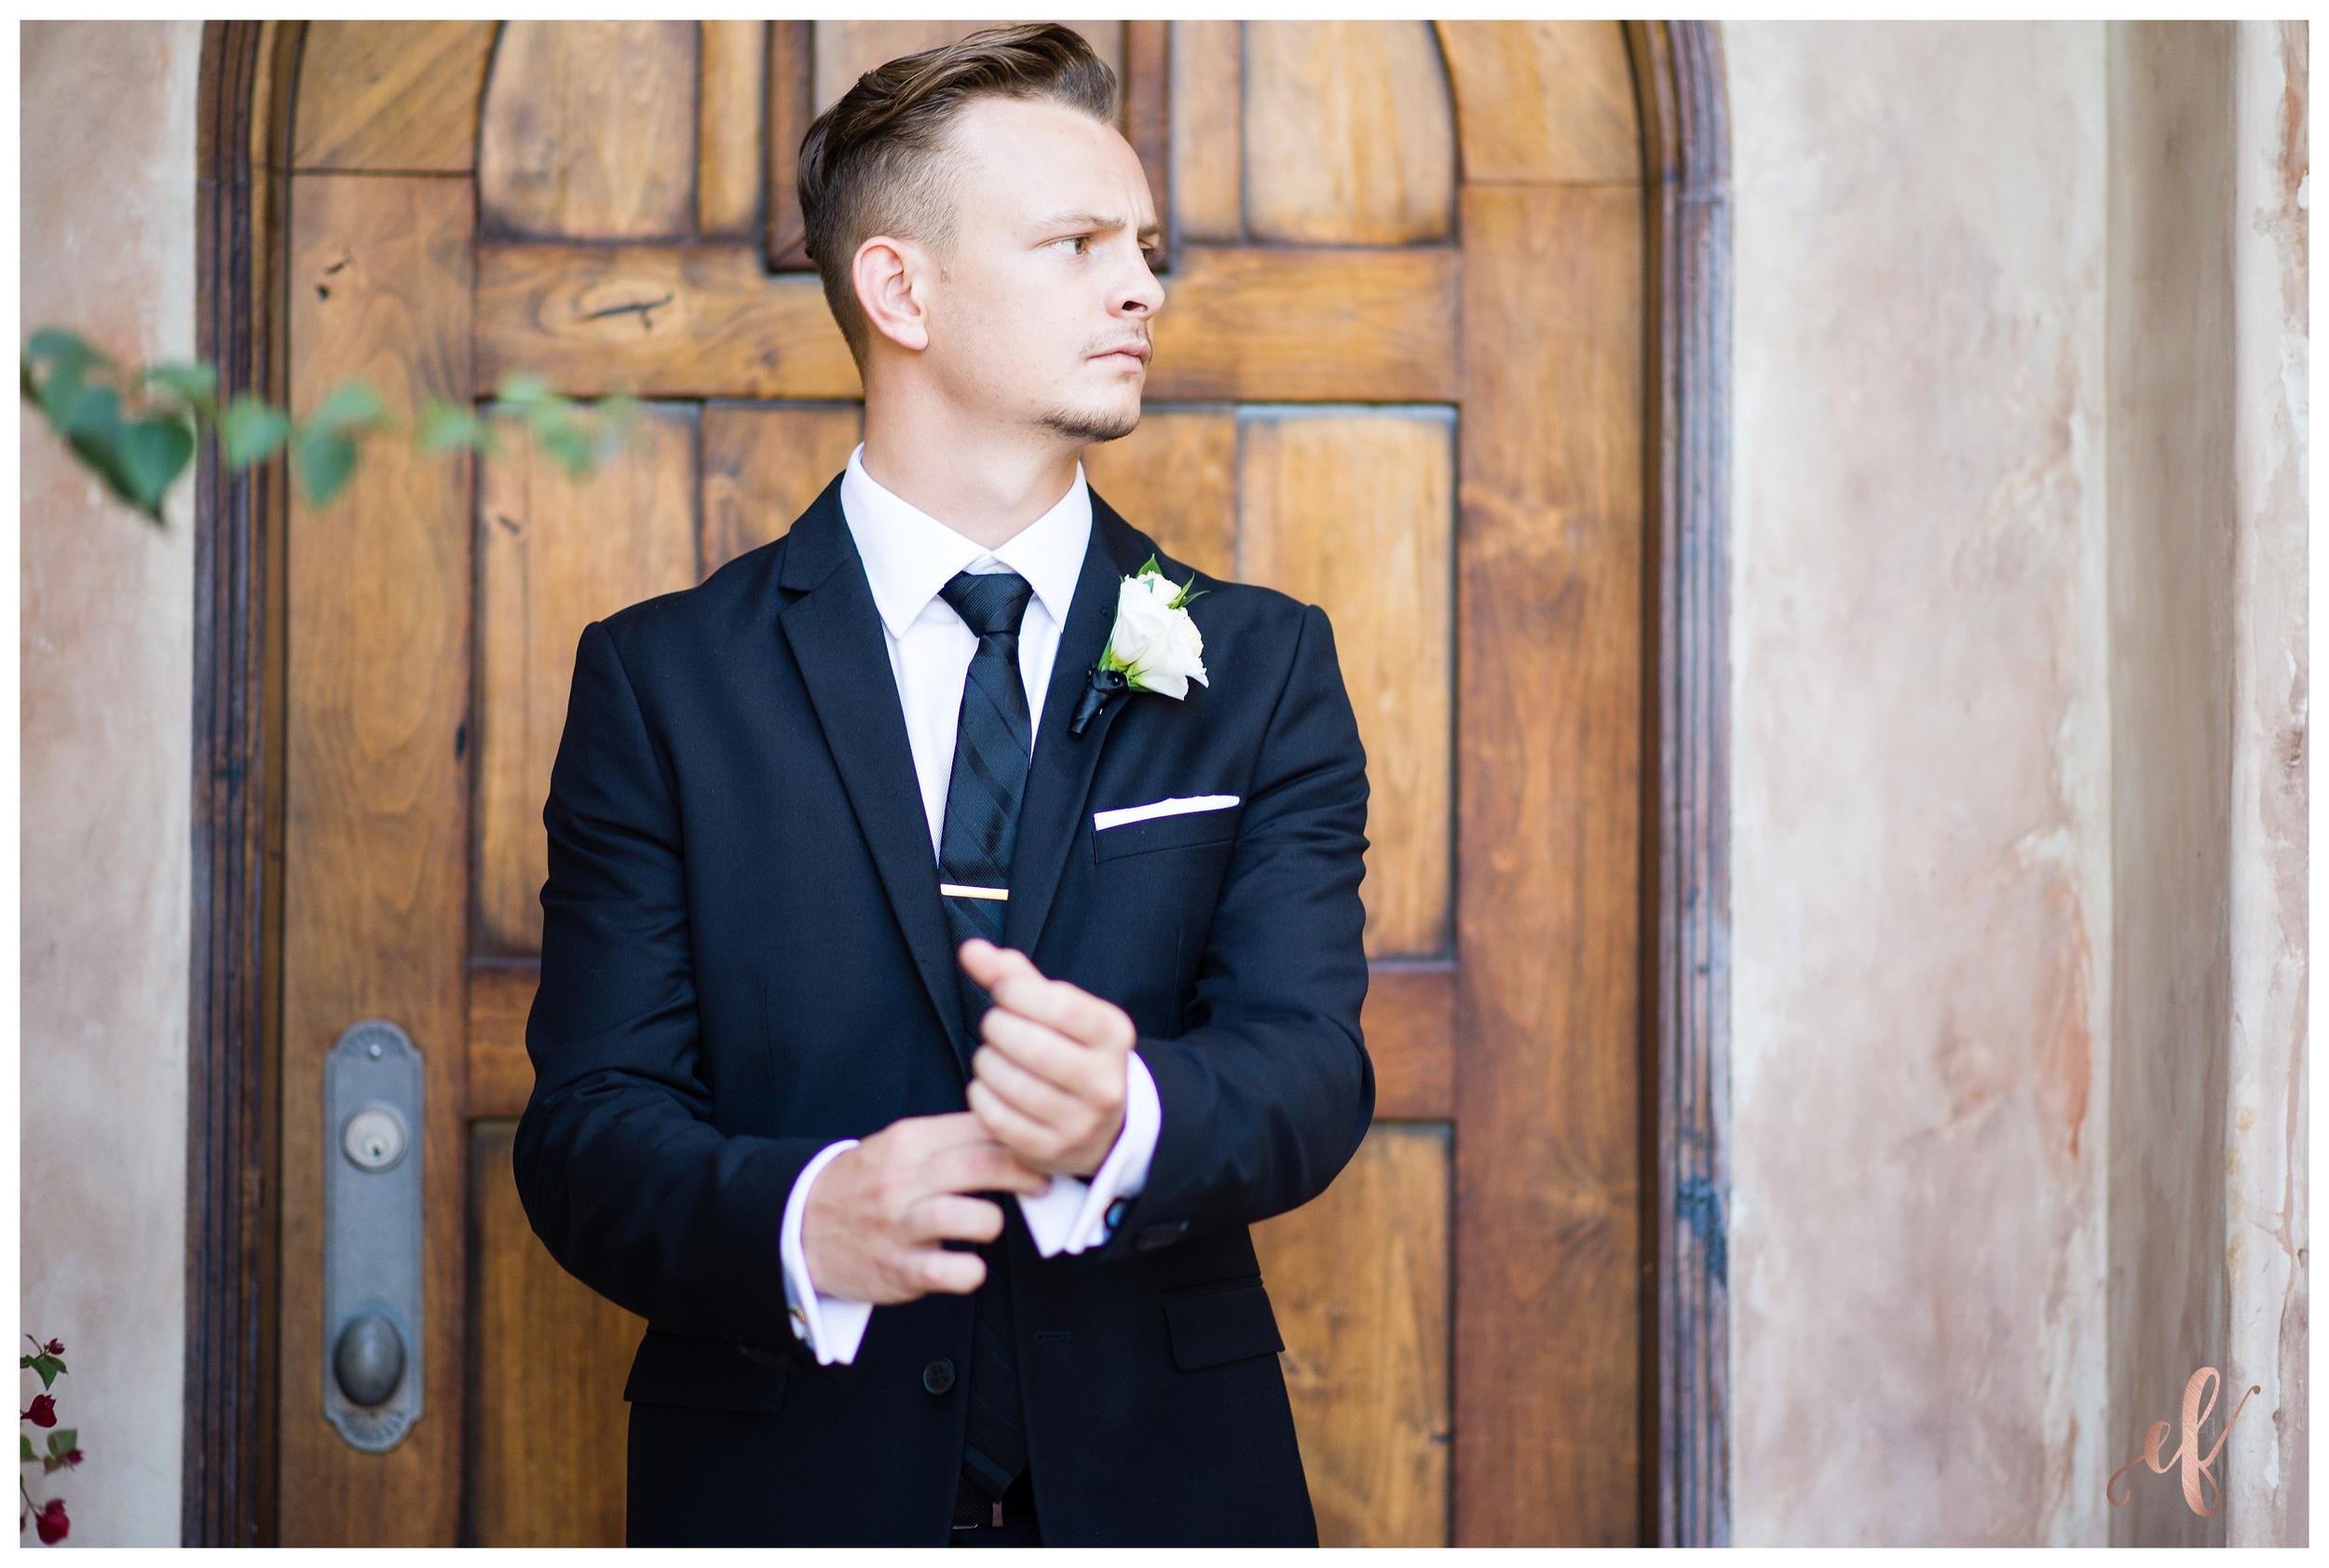 San Diego Wedding Photography | Groom | Rock Pose